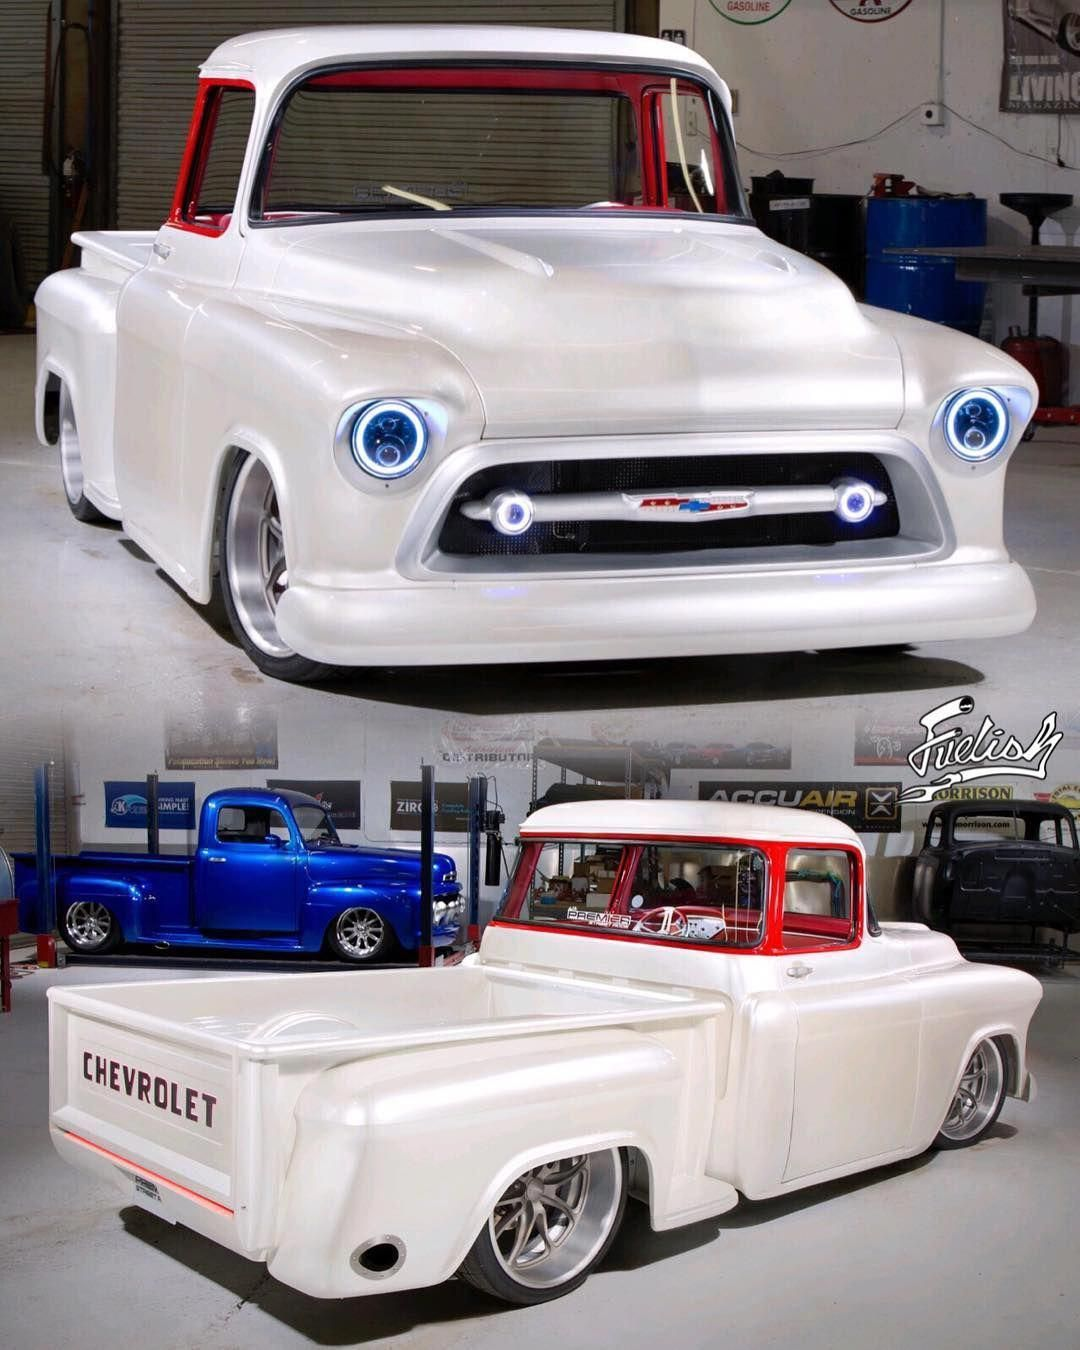 vintage classic cars #Classictrucks #Hotrodsclassiccars